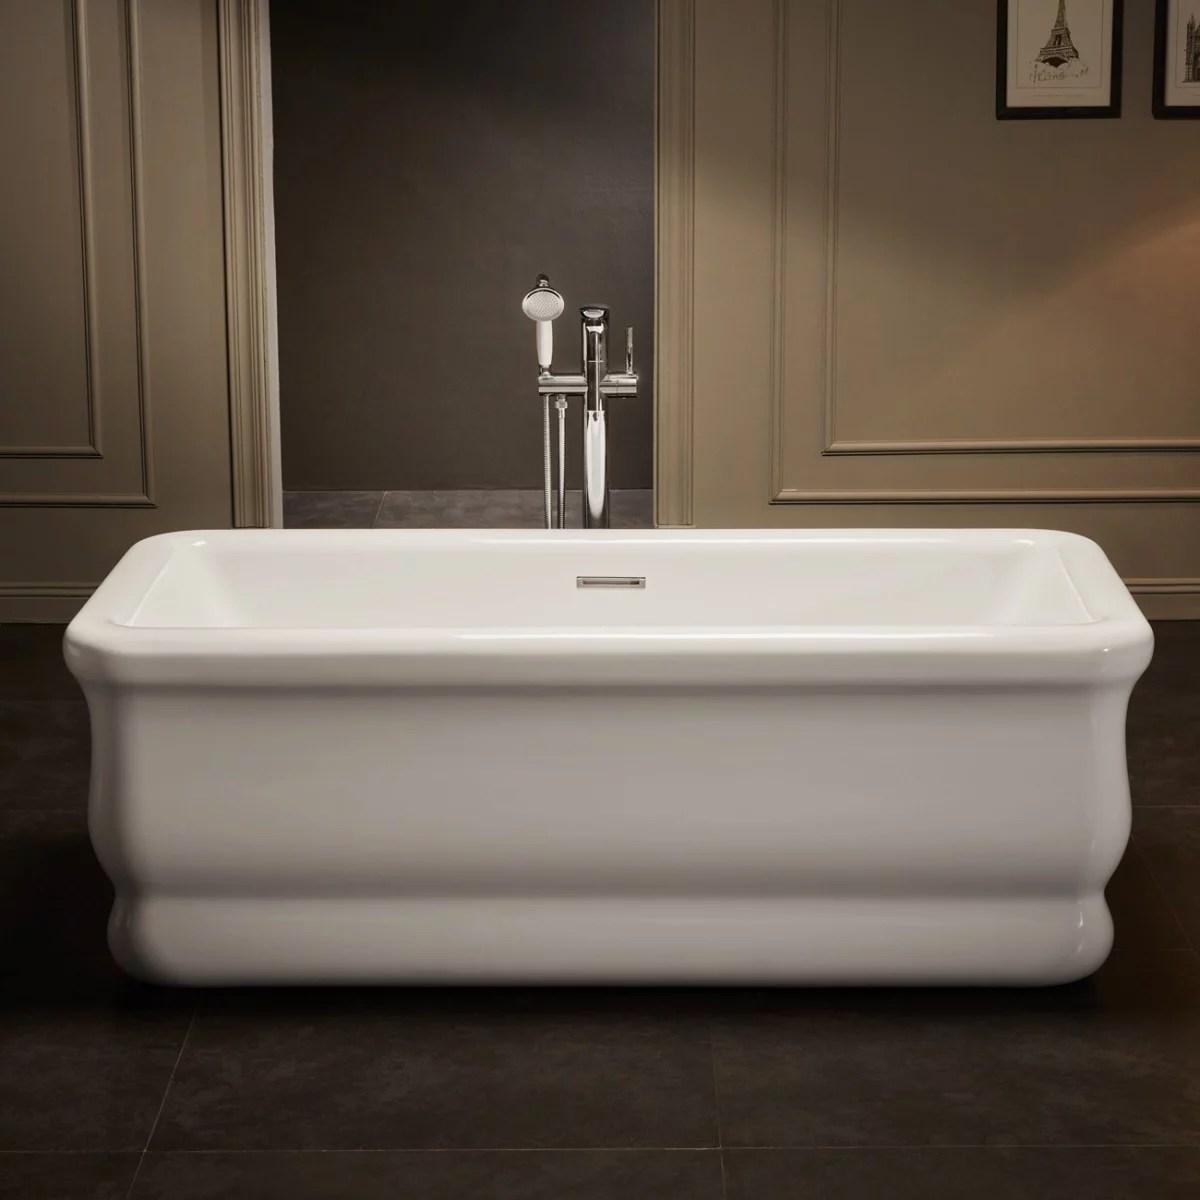 vintage tub bath brighton 67 inch acrylic double ended freestanding tub no faucet drillings walmart com